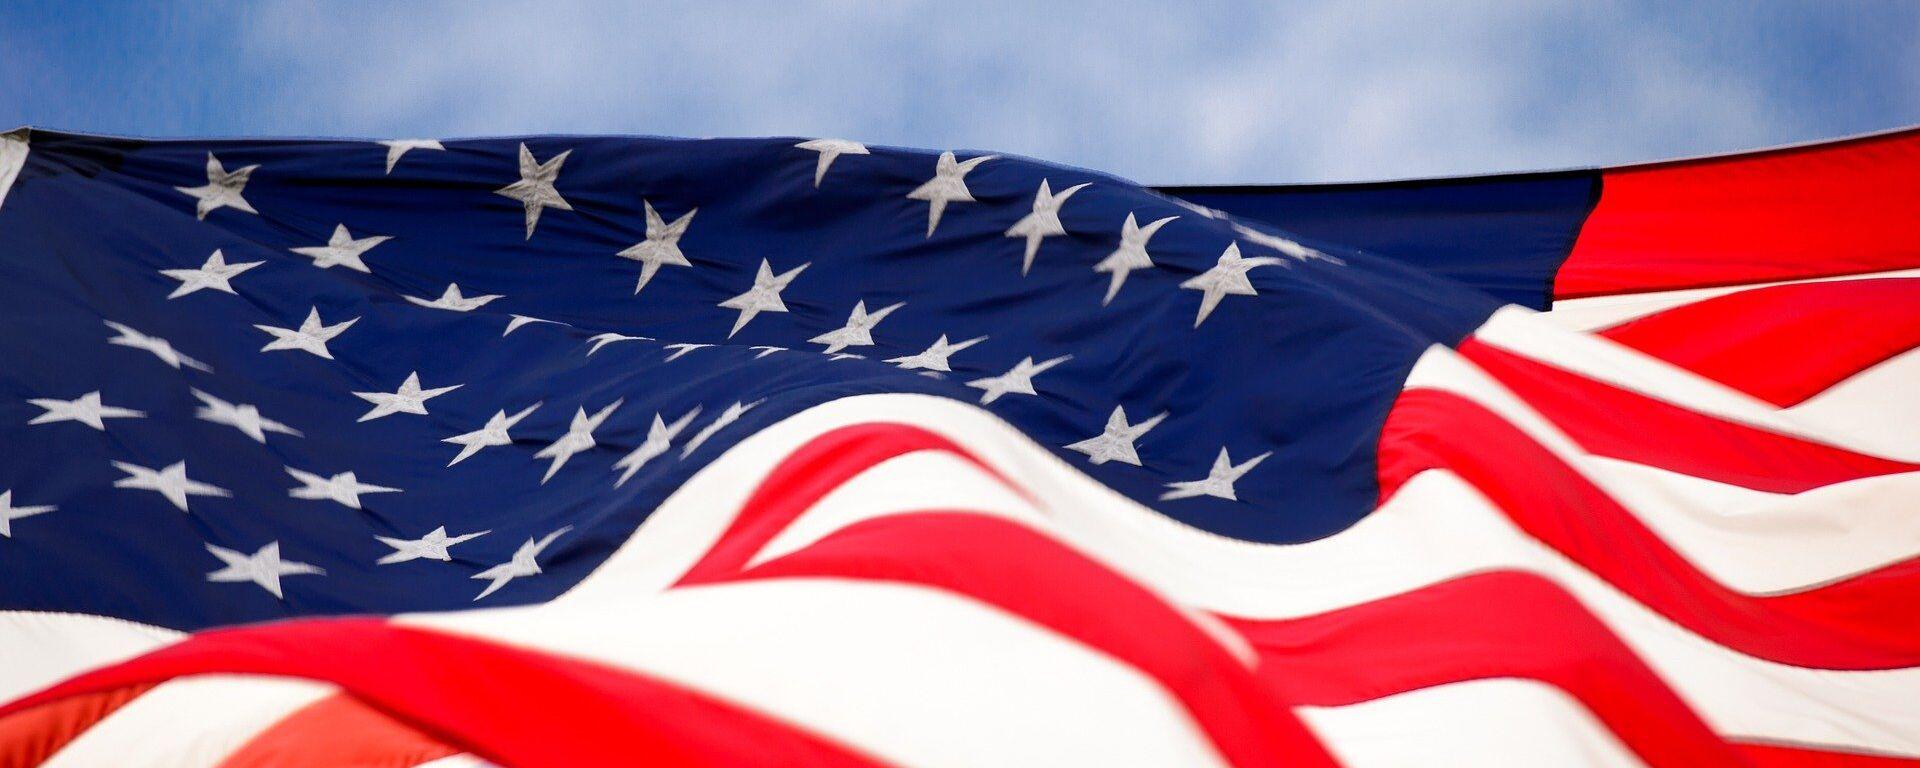 La bandera de EEUU - Sputnik Mundo, 1920, 09.05.2021